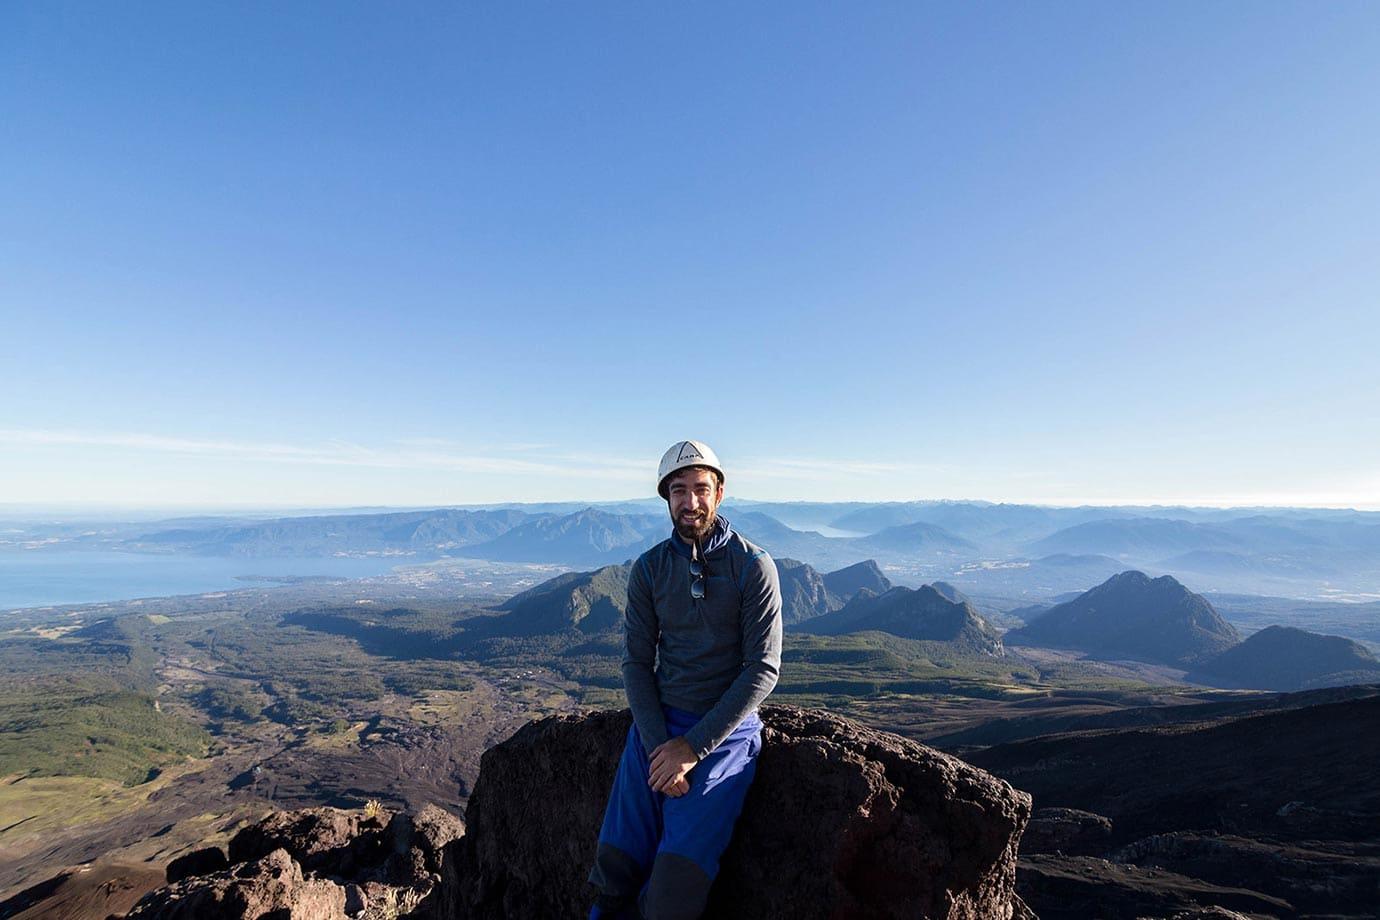 The views at Volcano Villarrica